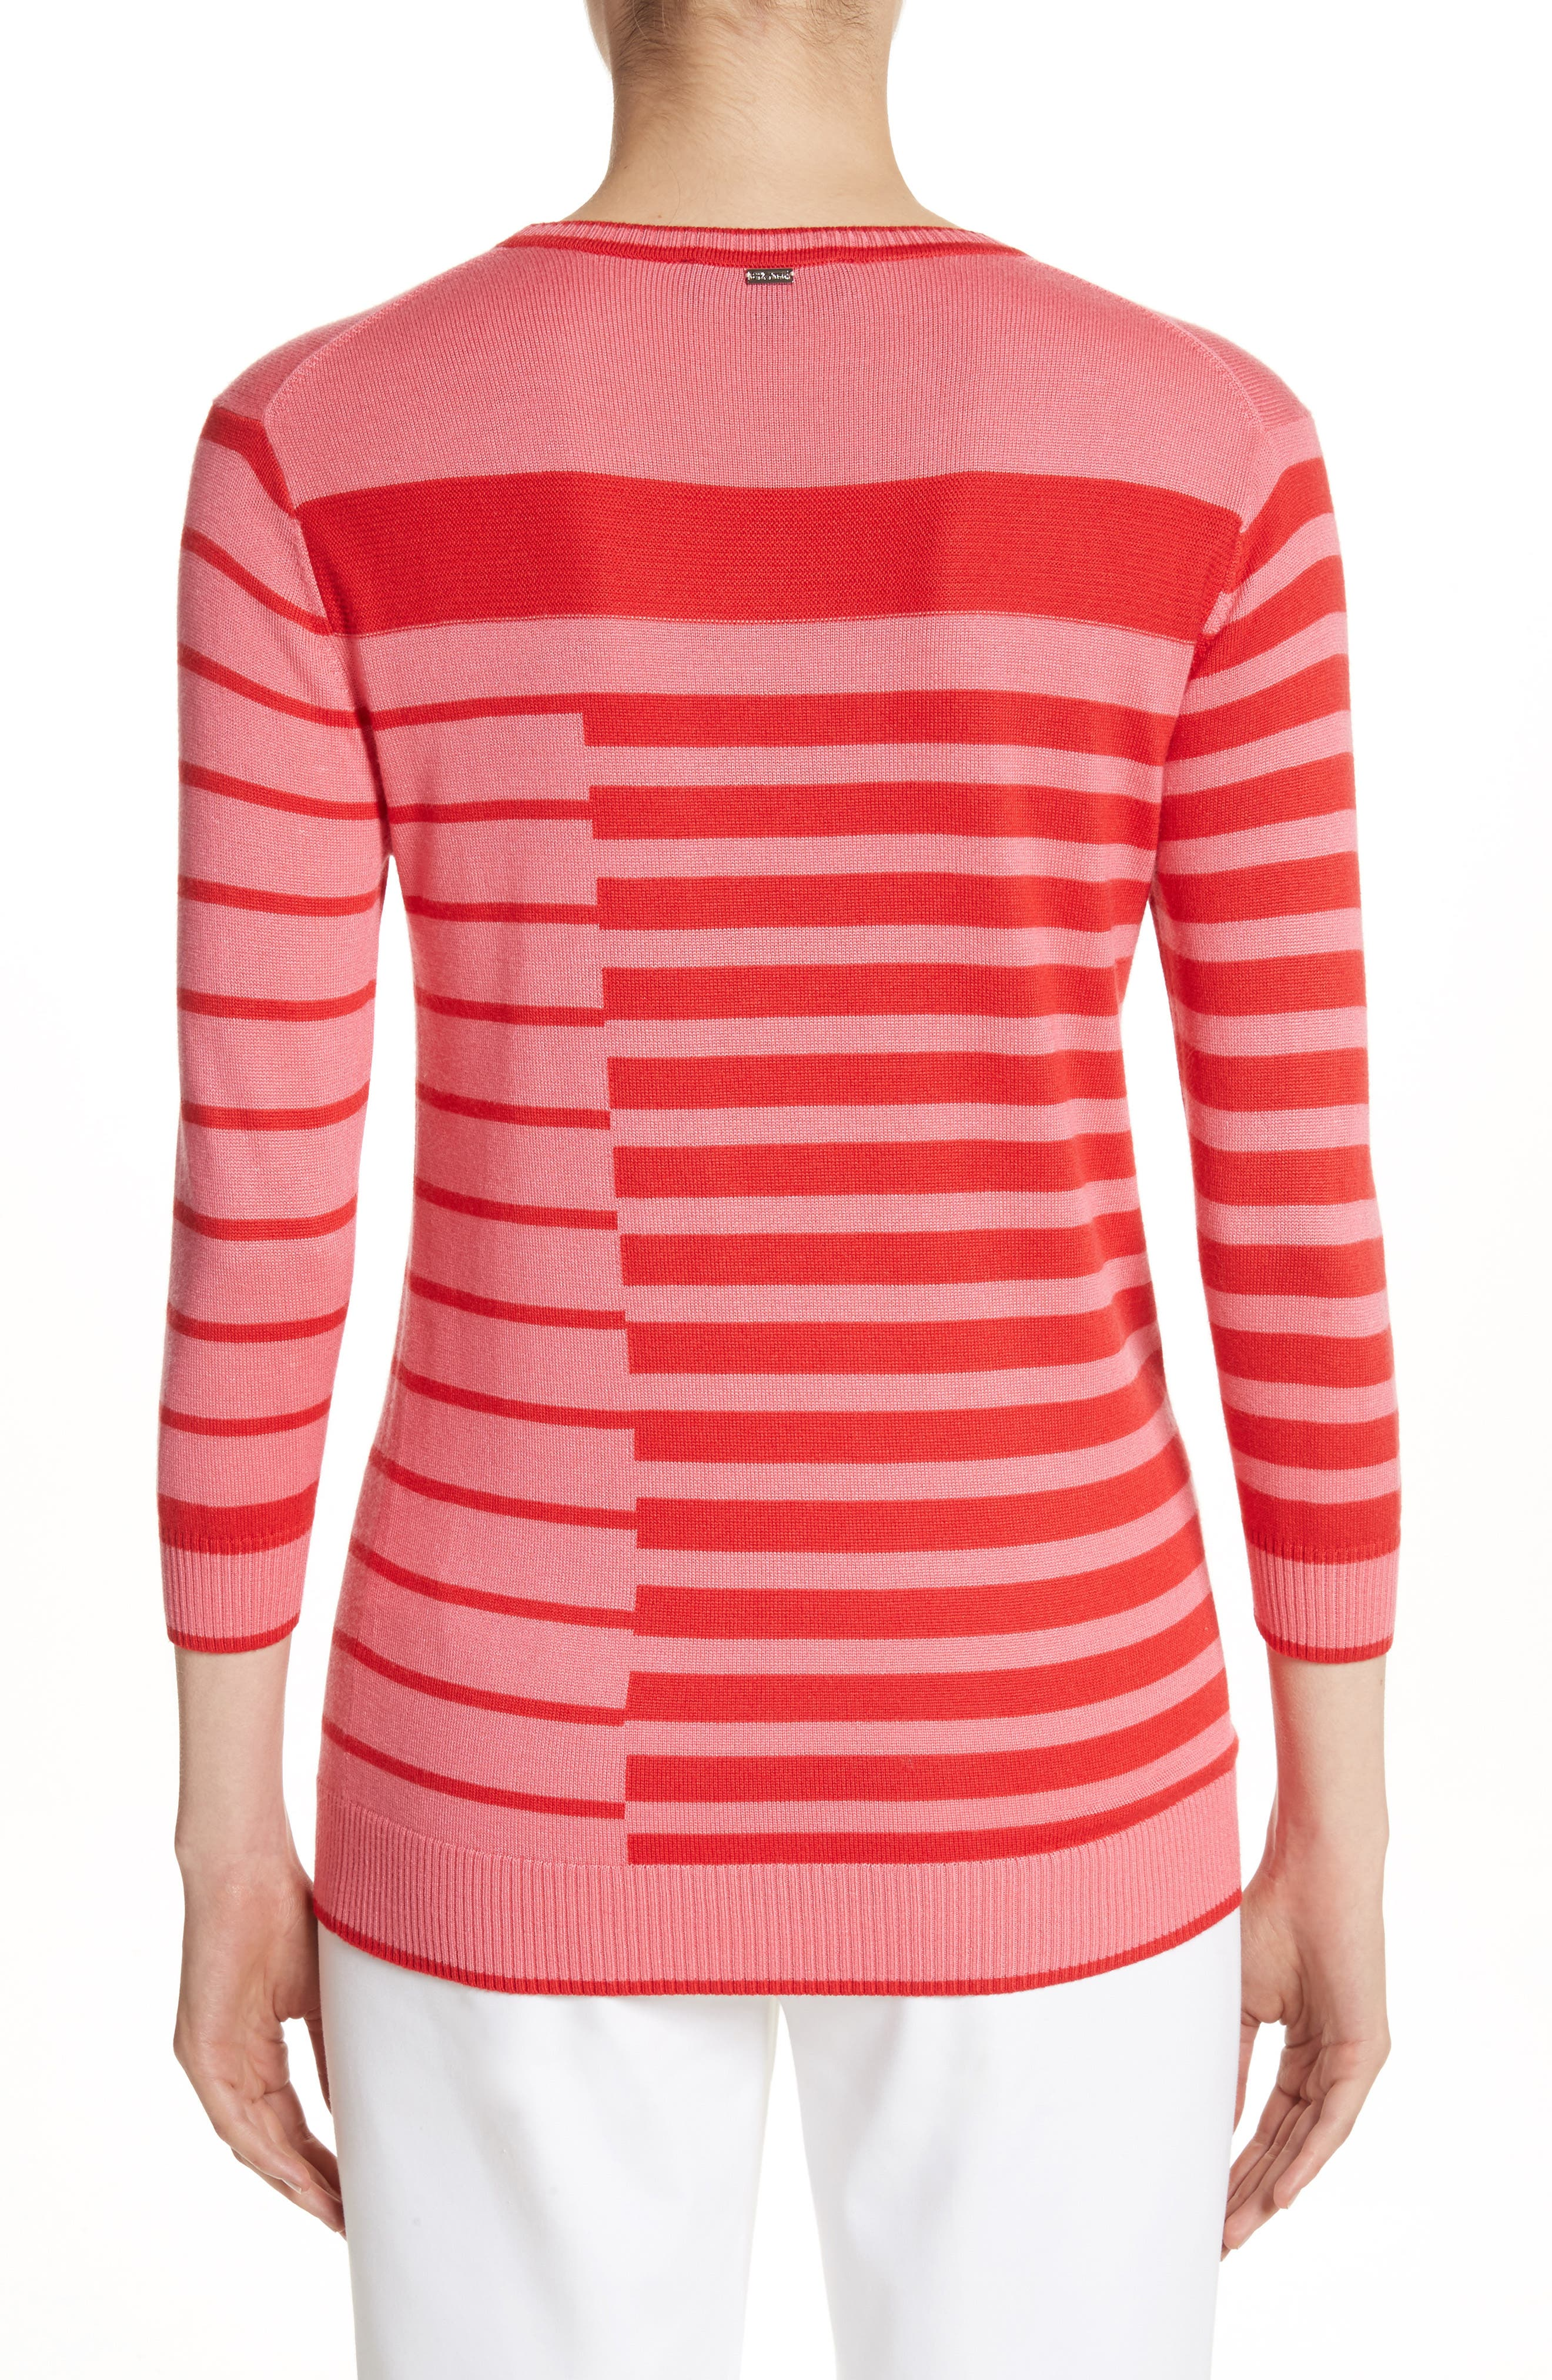 Intarsia Stripe Sweater,                             Alternate thumbnail 2, color,                             660